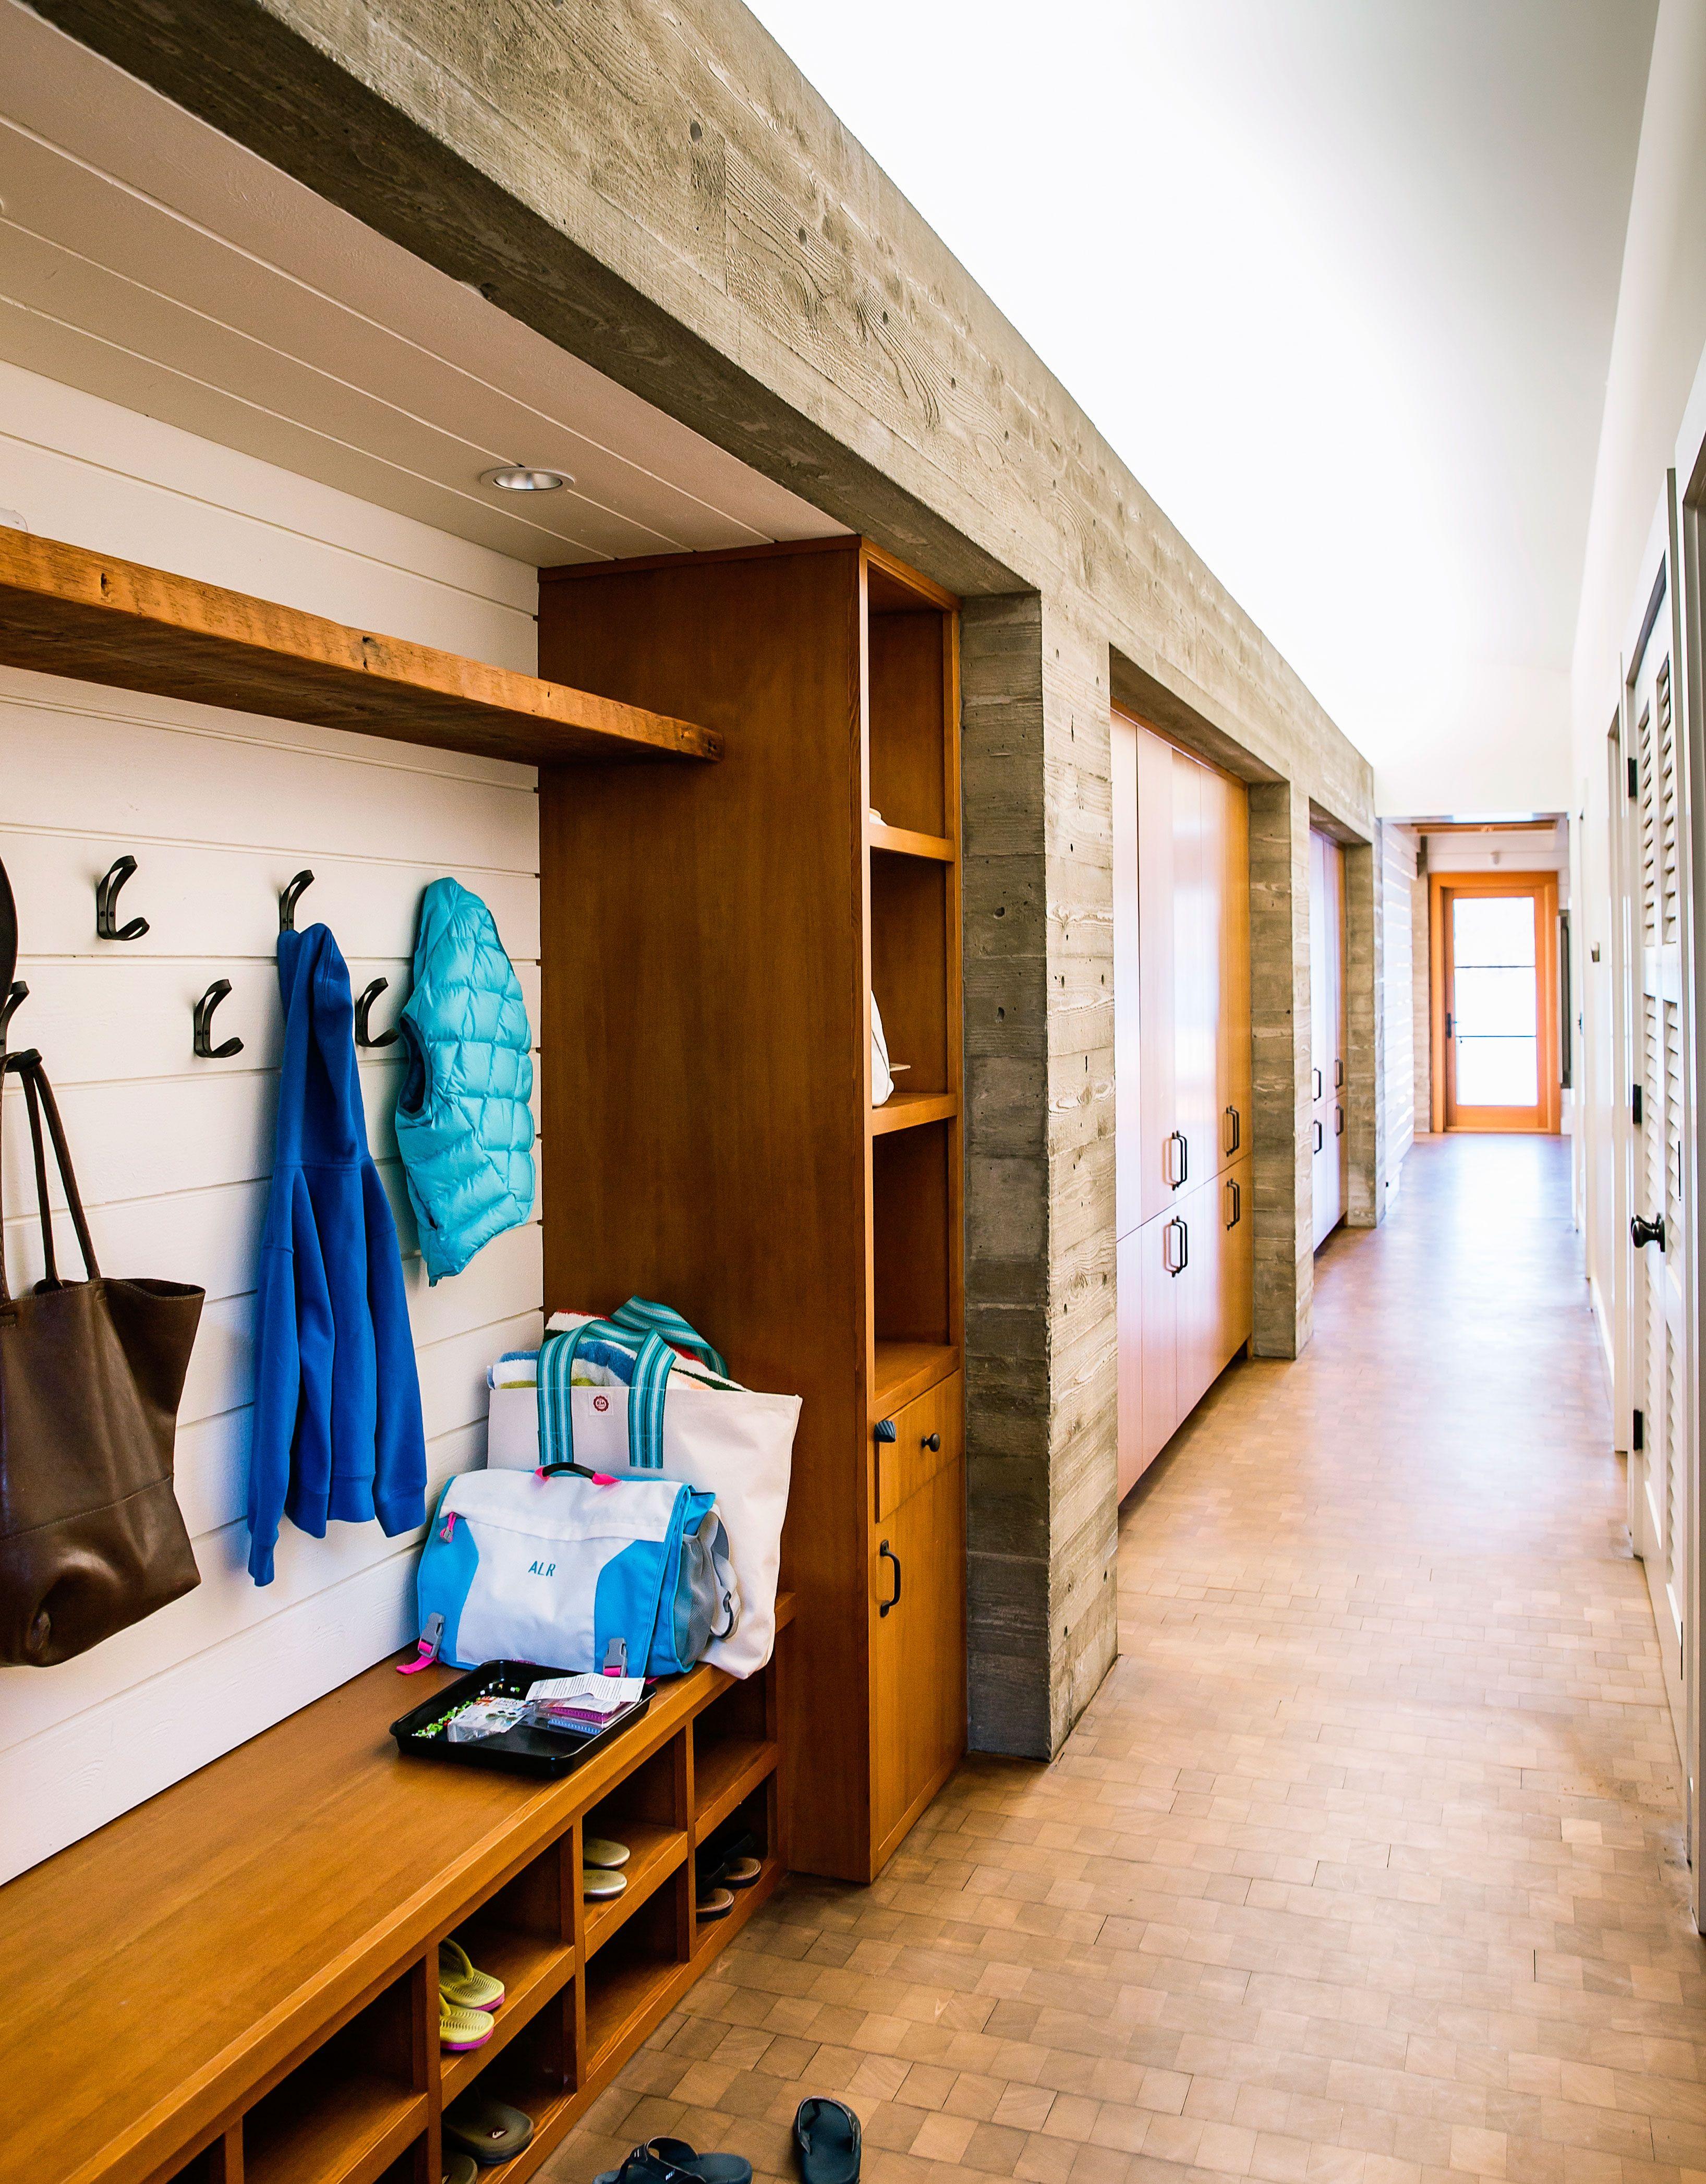 Modern hallway storage ideas  Hallway  eme entree  Pinterest  Architecture design and House